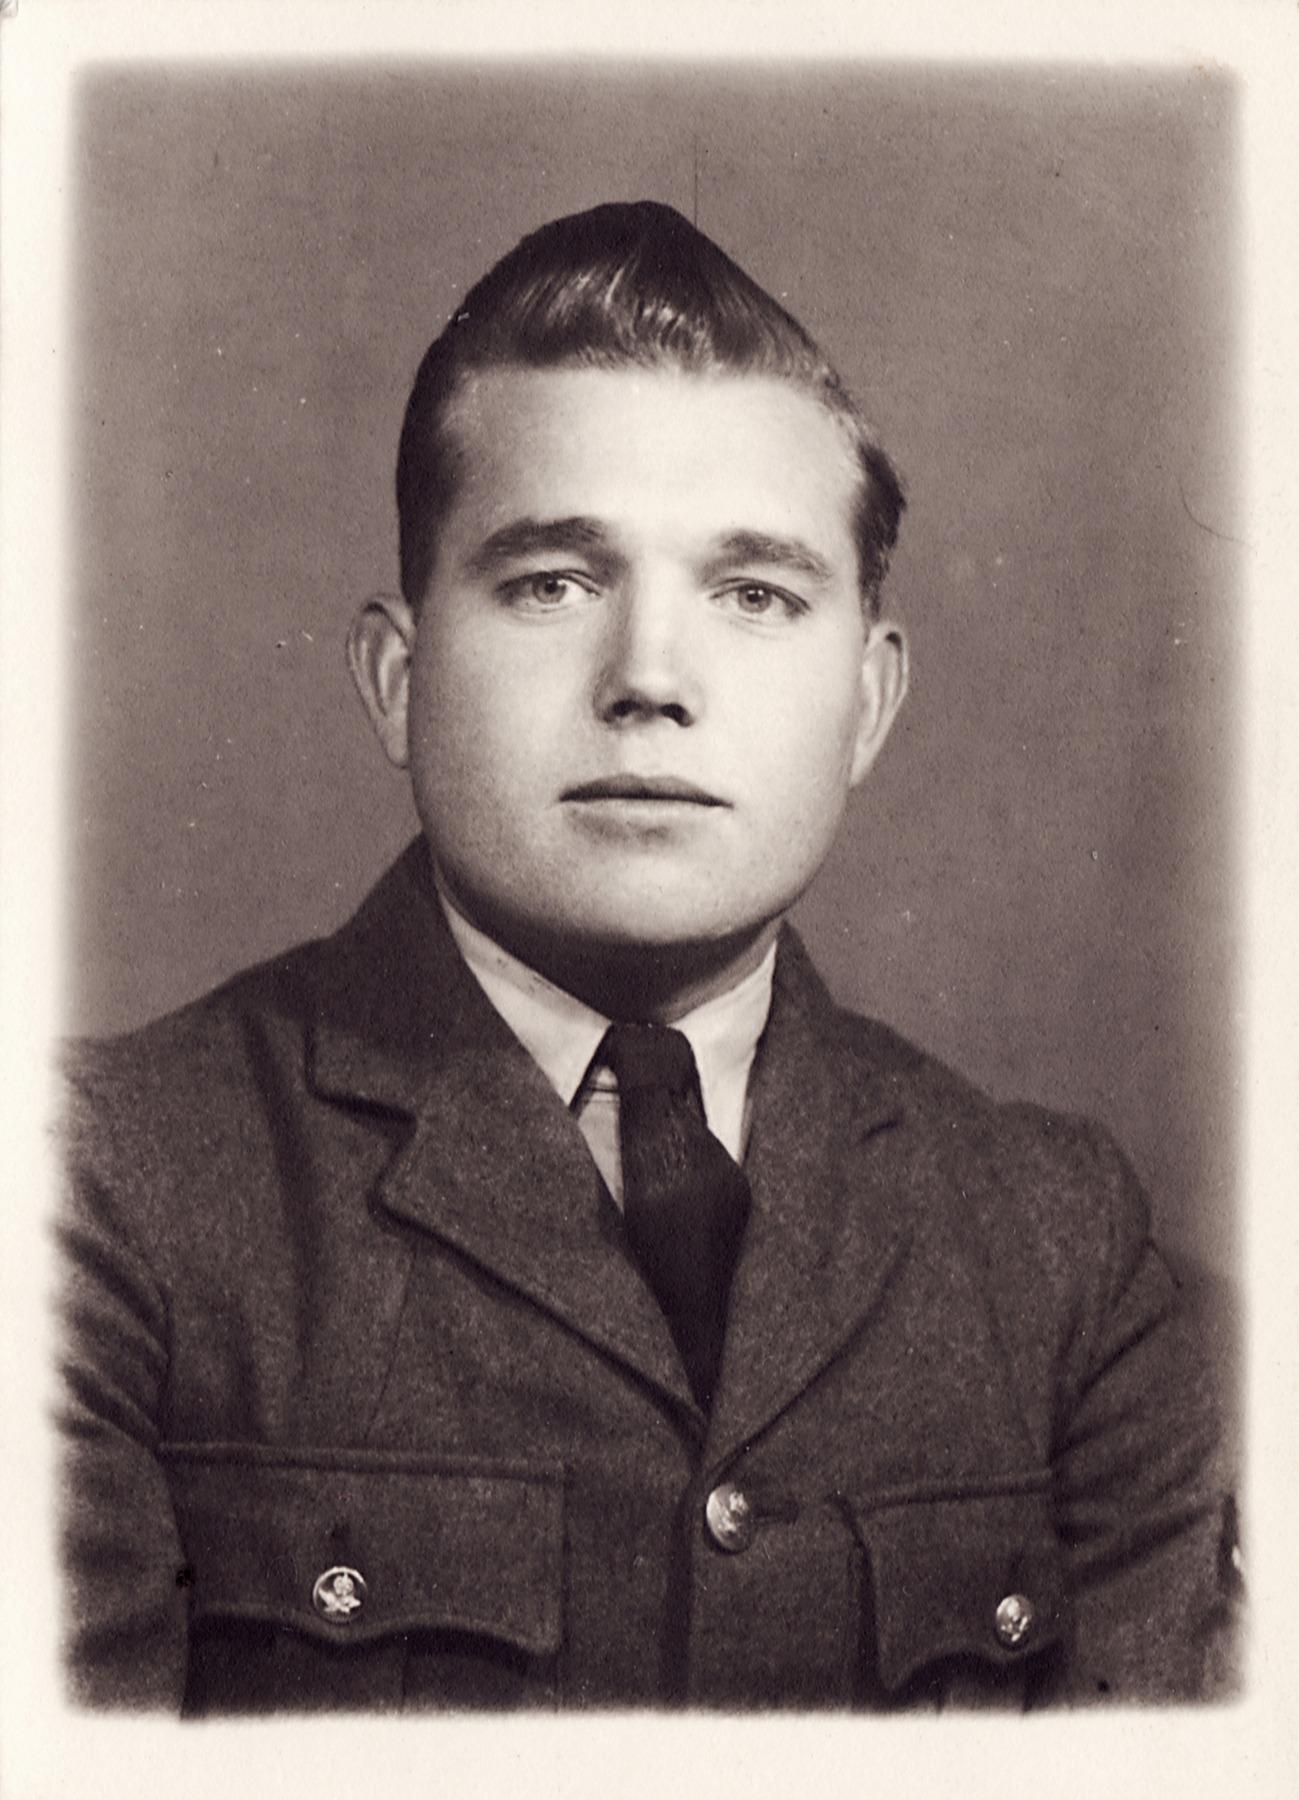 Fred Perkins portrait